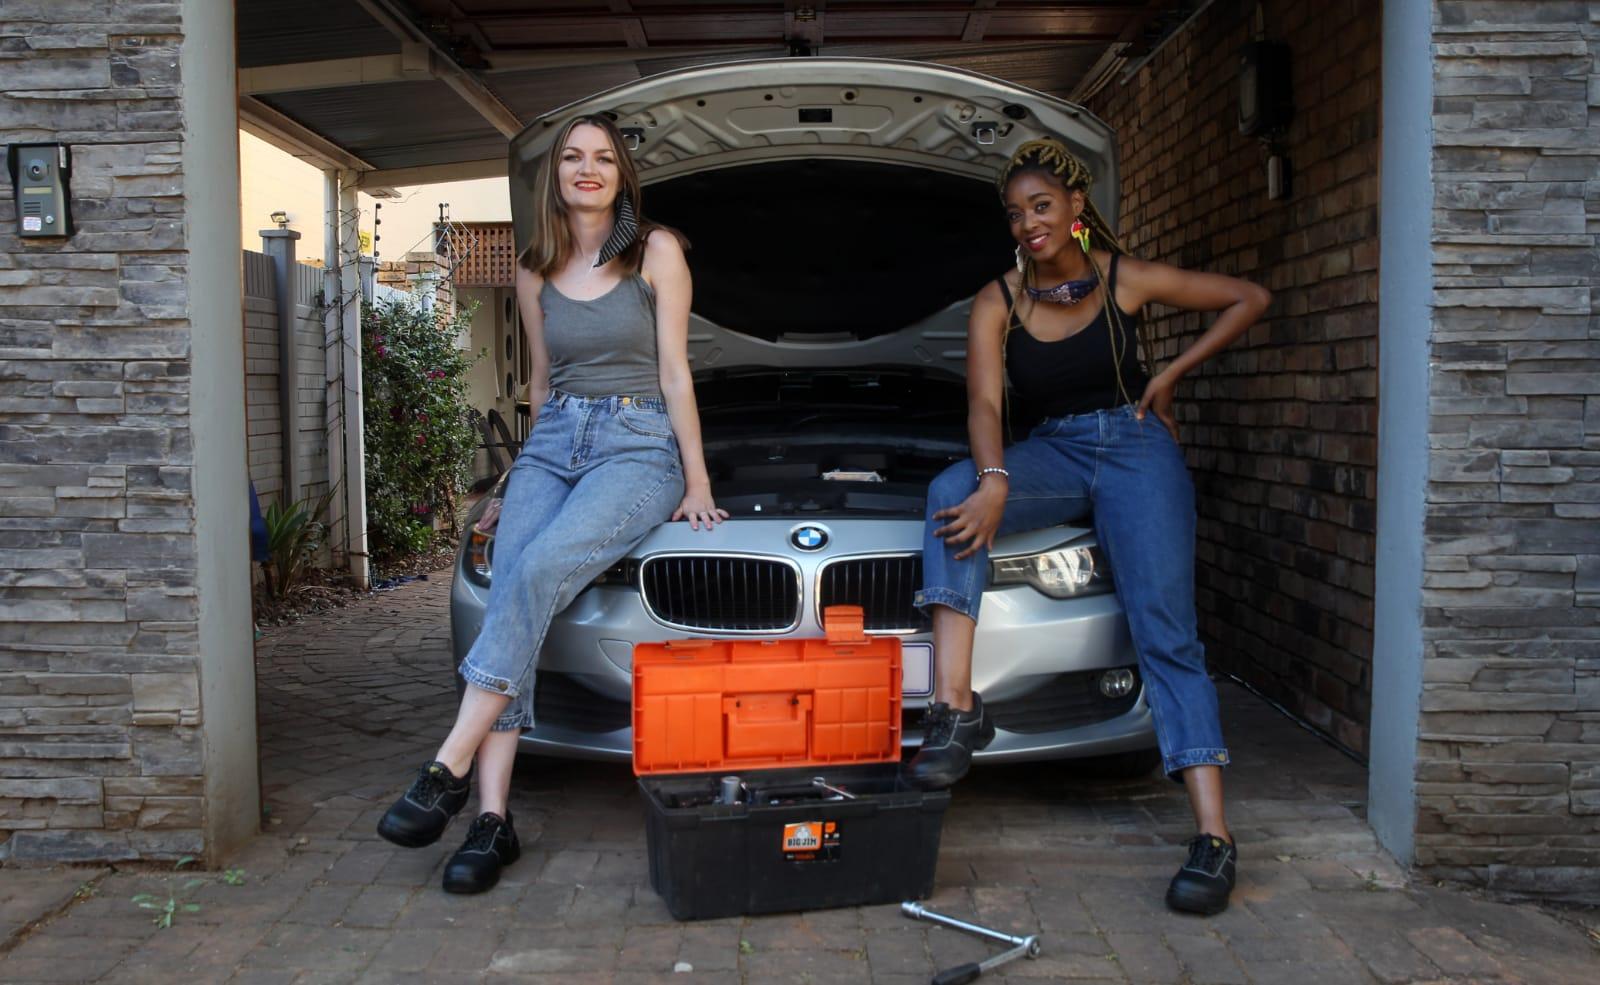 Women-only mechanics start-up in Pretoria